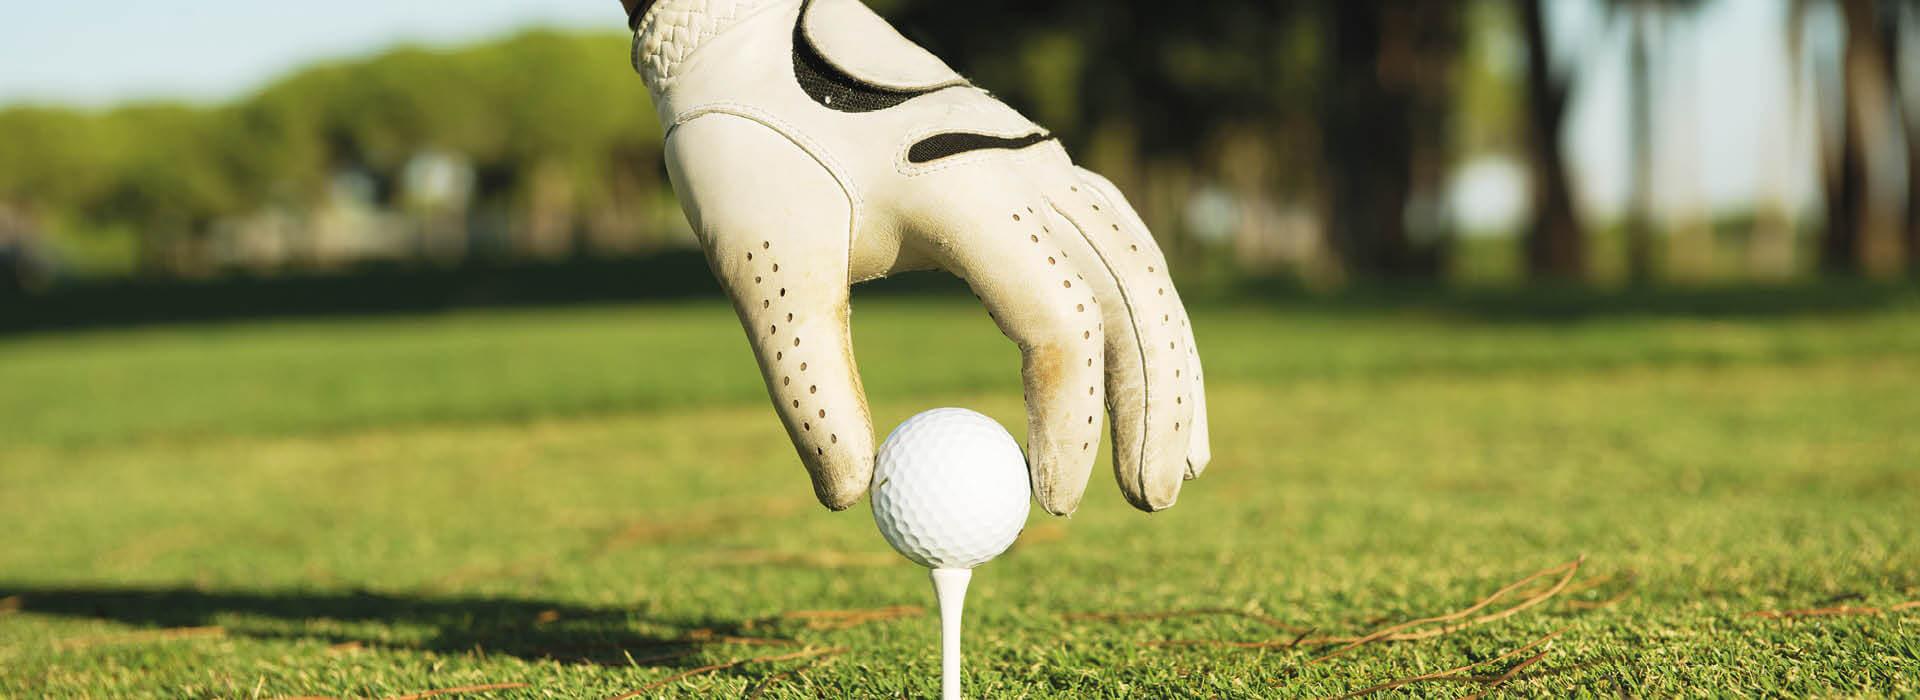 https://golfclub-peckeloh.de/wp-content/uploads/2021/02/GOPE21-073_Header_1920_x_700px2.jpg